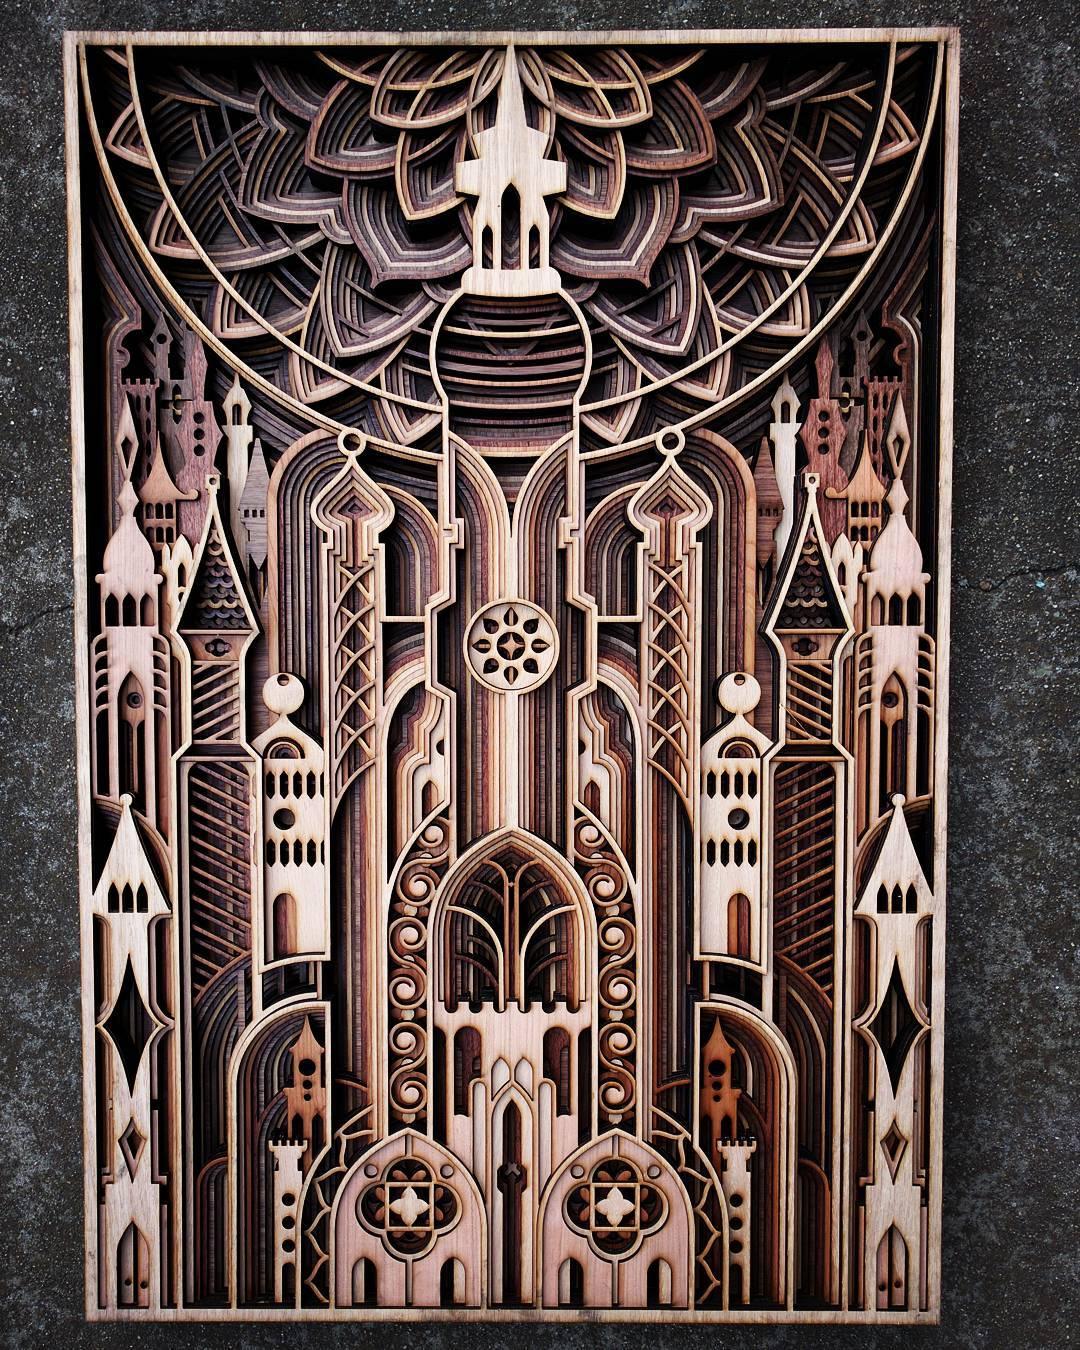 Резьба по дереву от Габриэля Шама (Gabriel Schama)